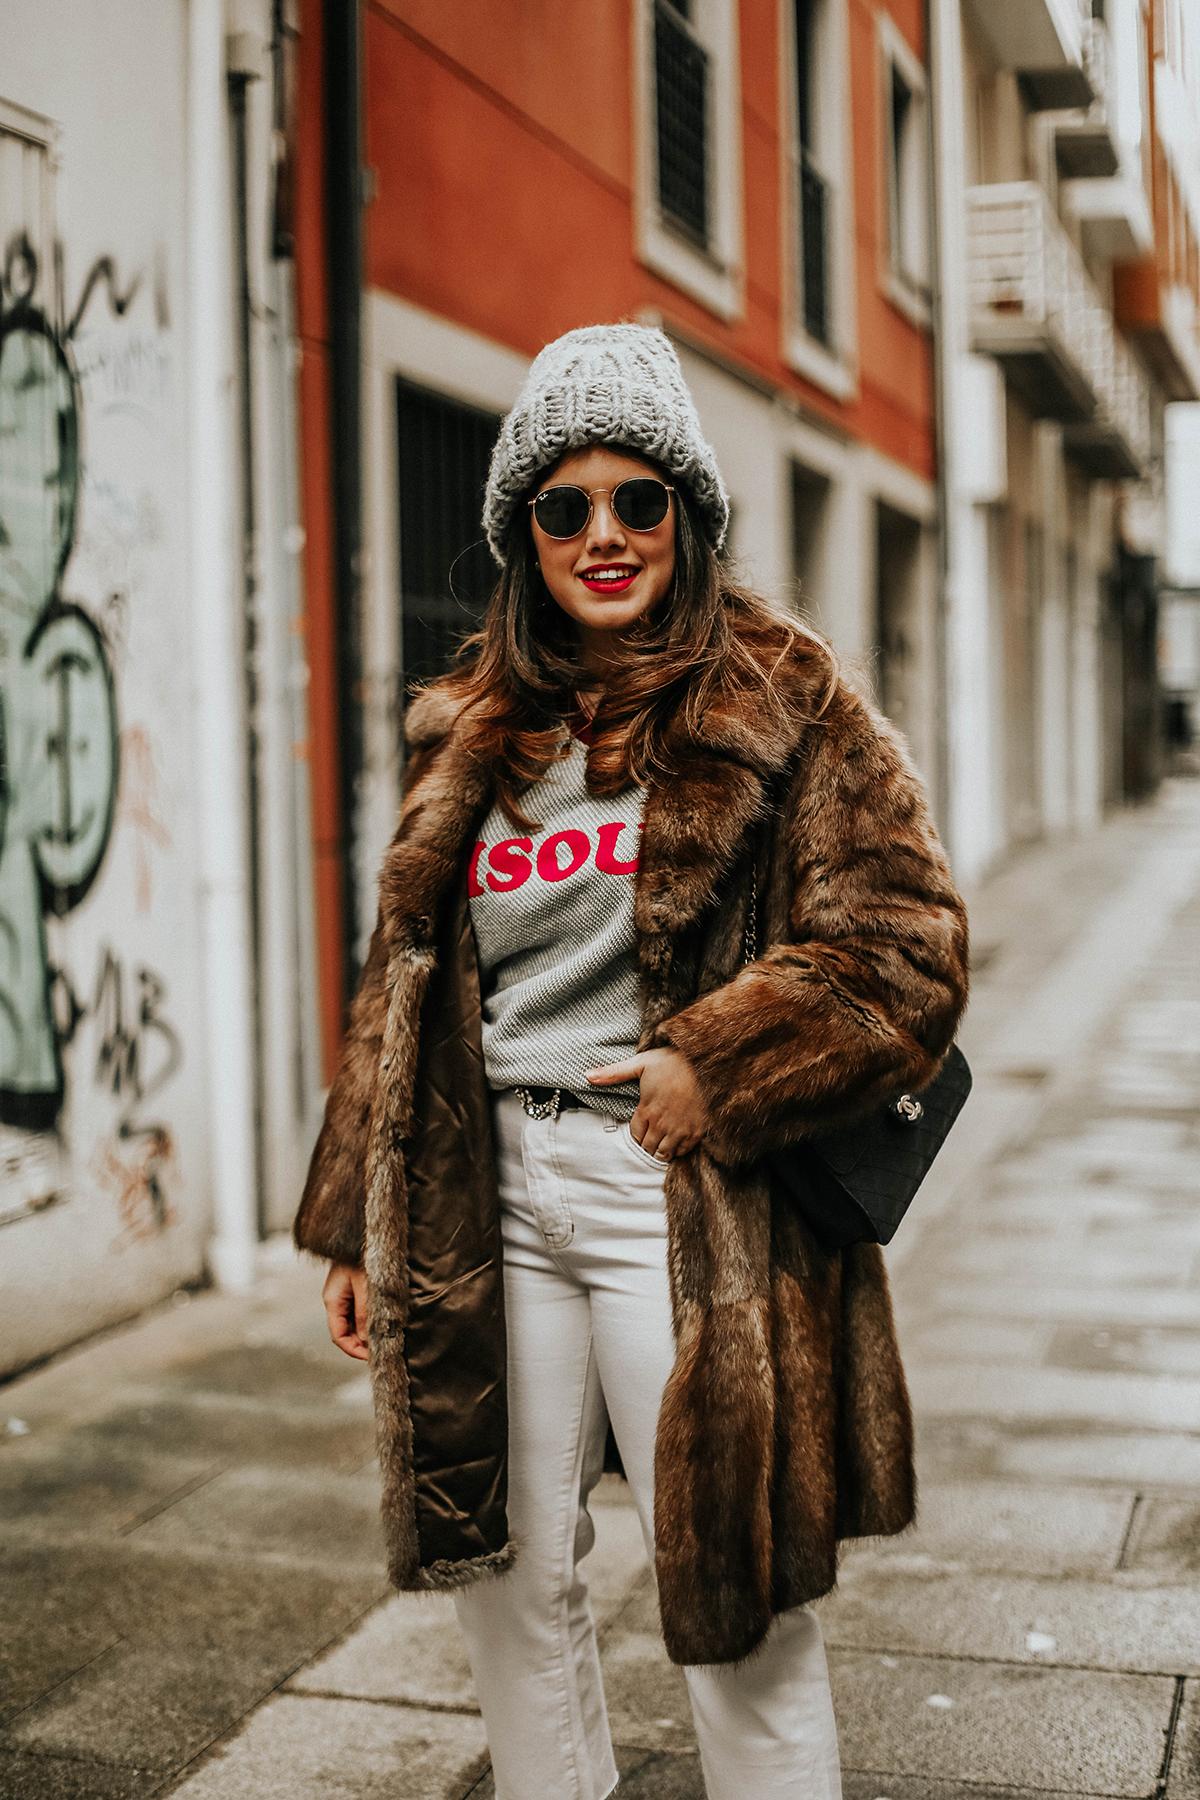 sudadera-deartee-abrigo-pelo-look-myblueberrynightsblog